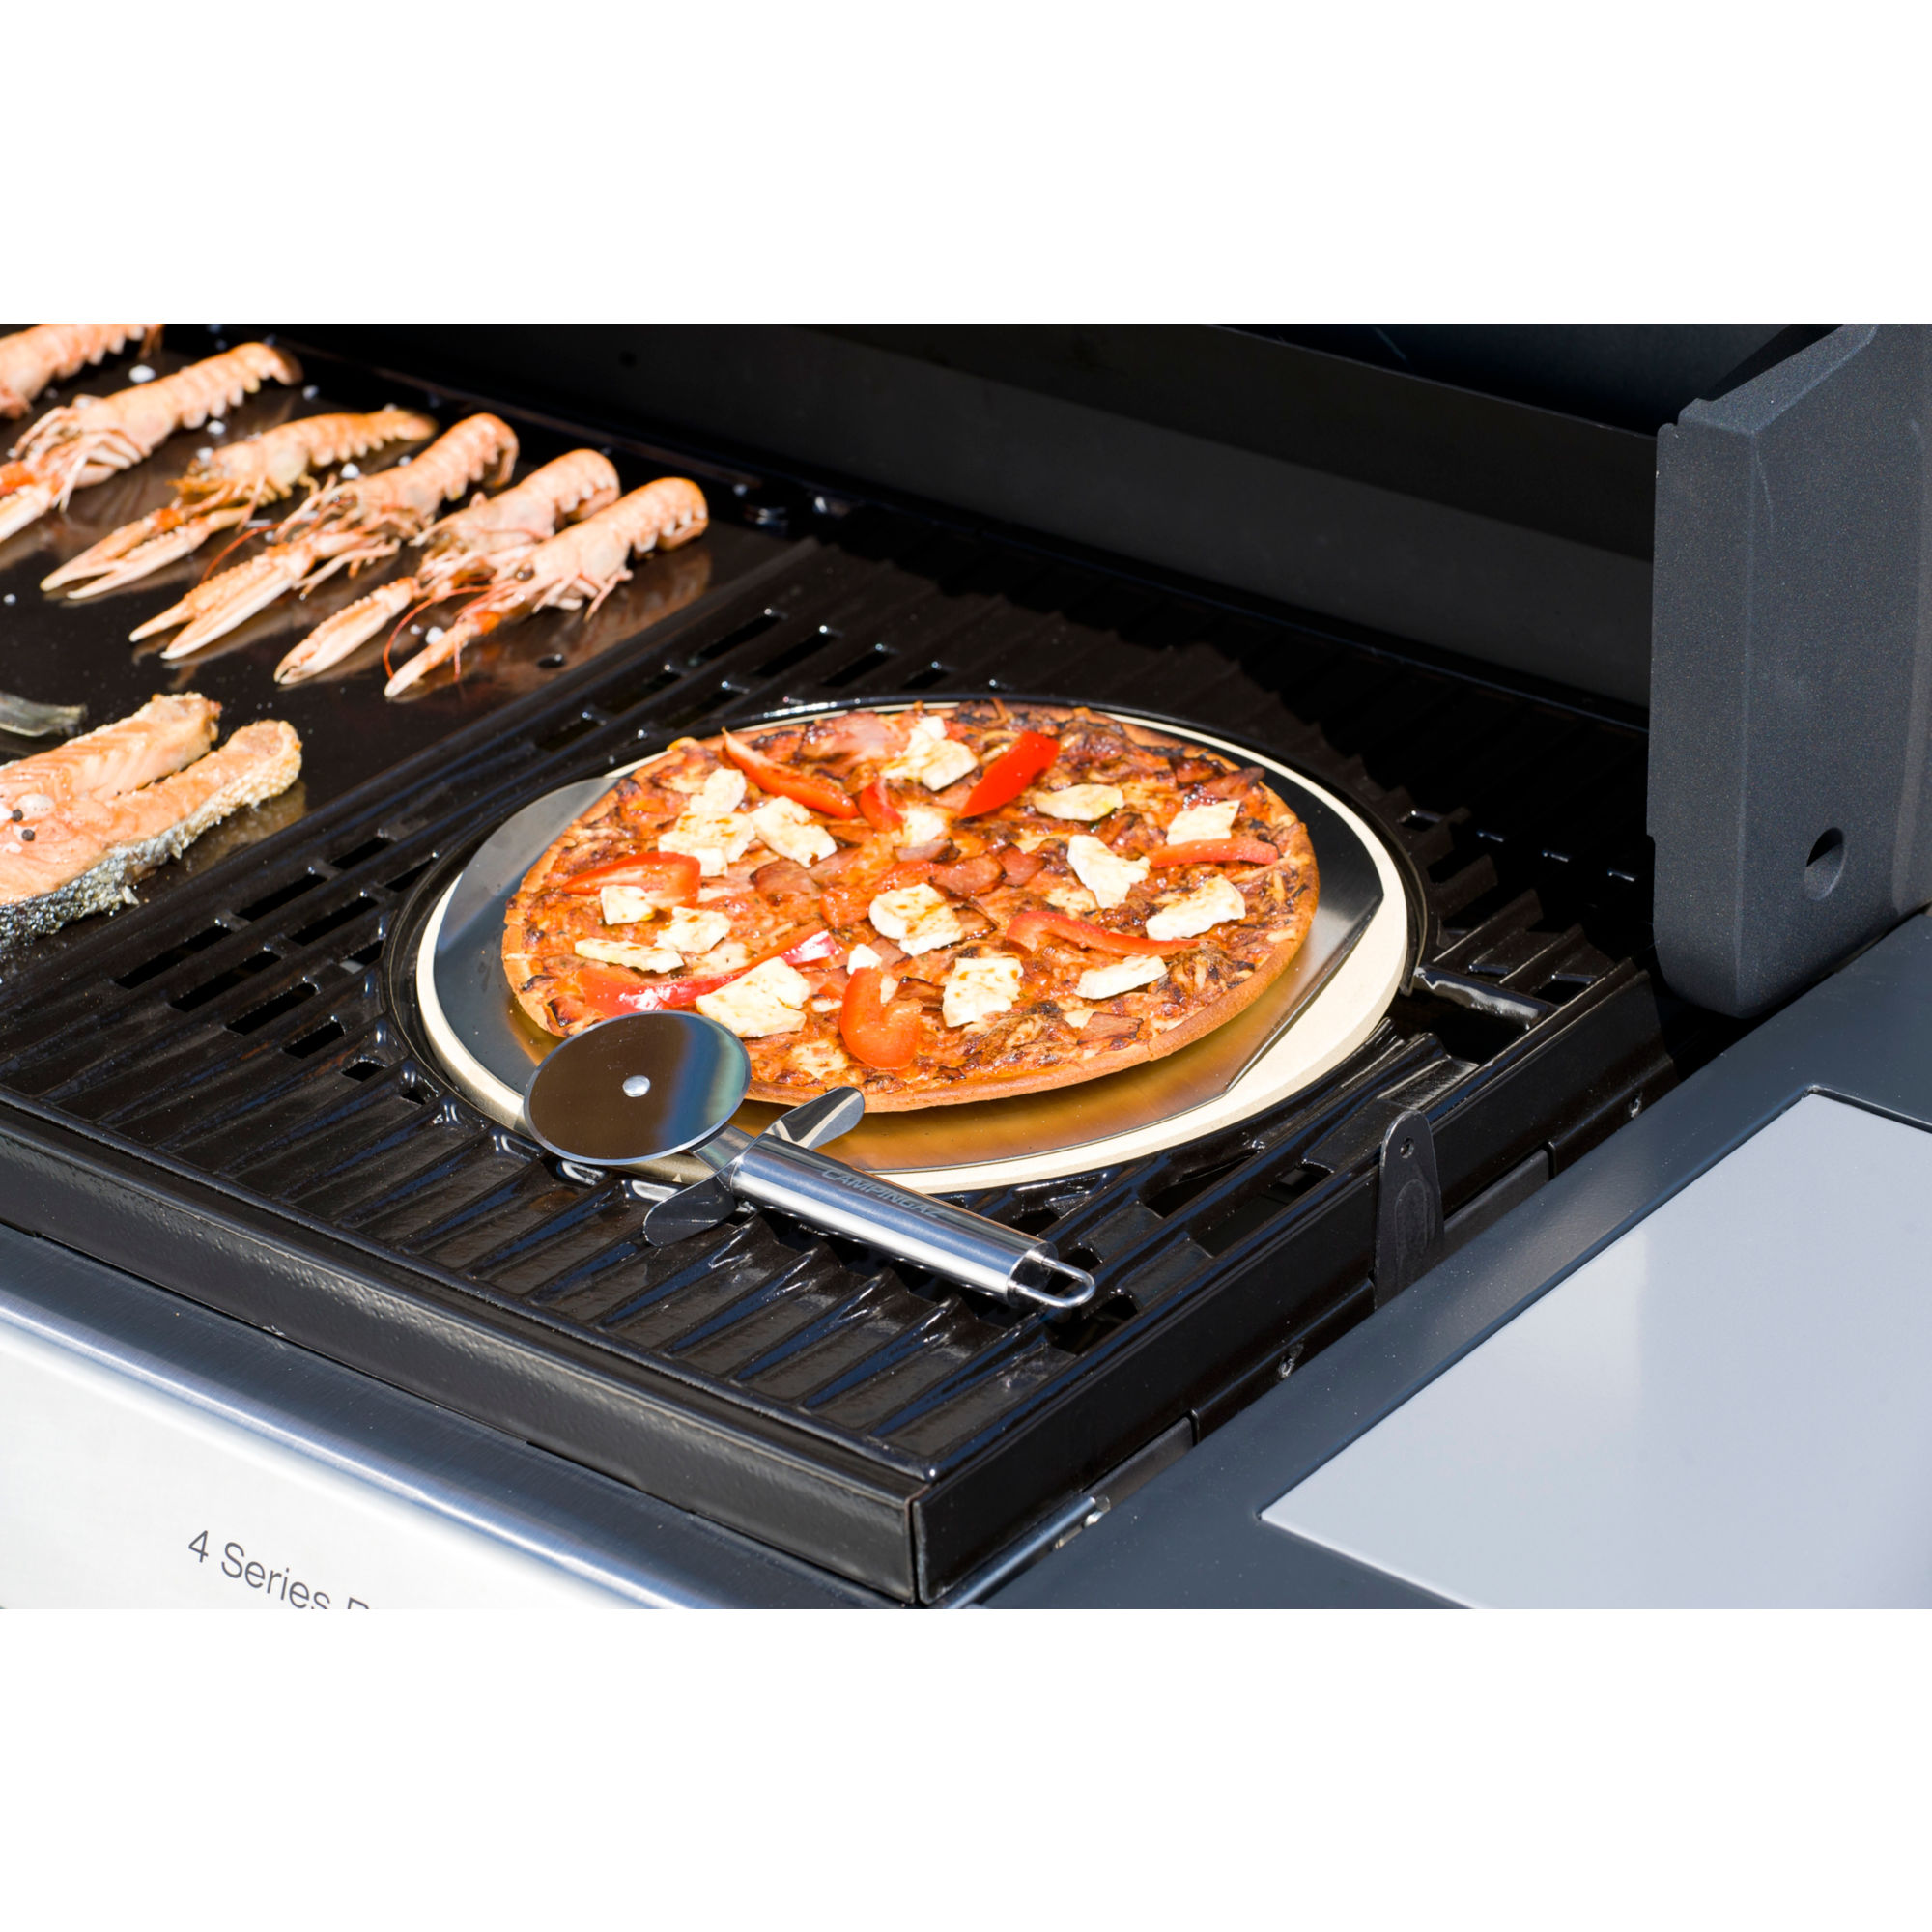 Culinary Modular Pizza Stone